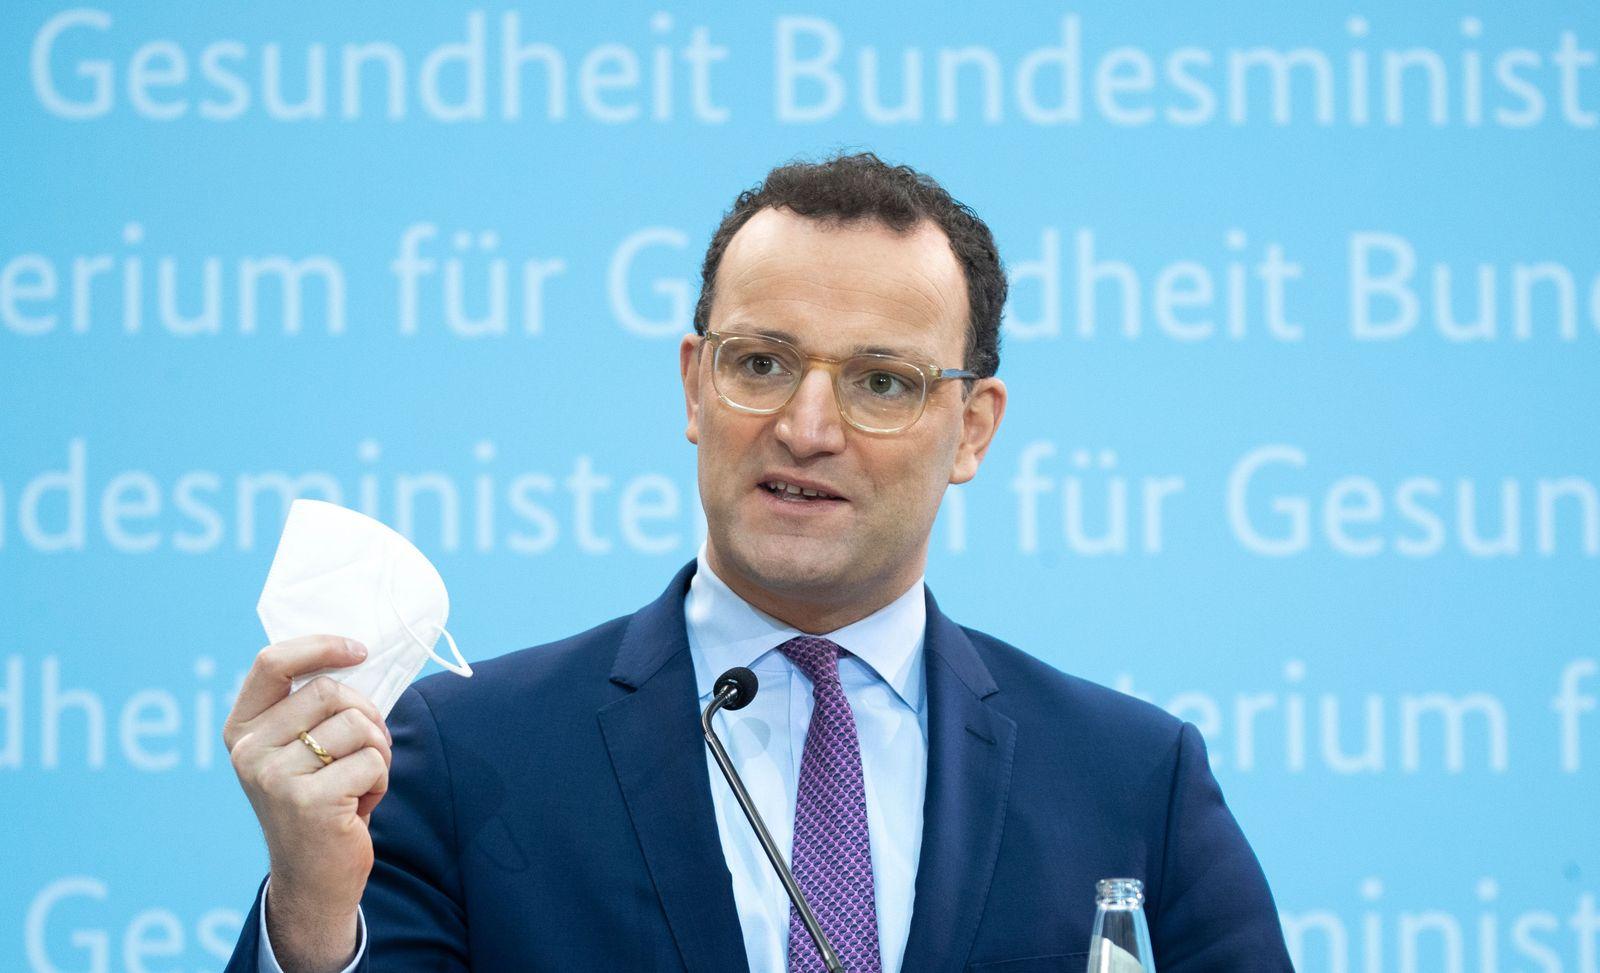 German health minister Spahn press conference, Berlin, Germany - 18 Jan 2021